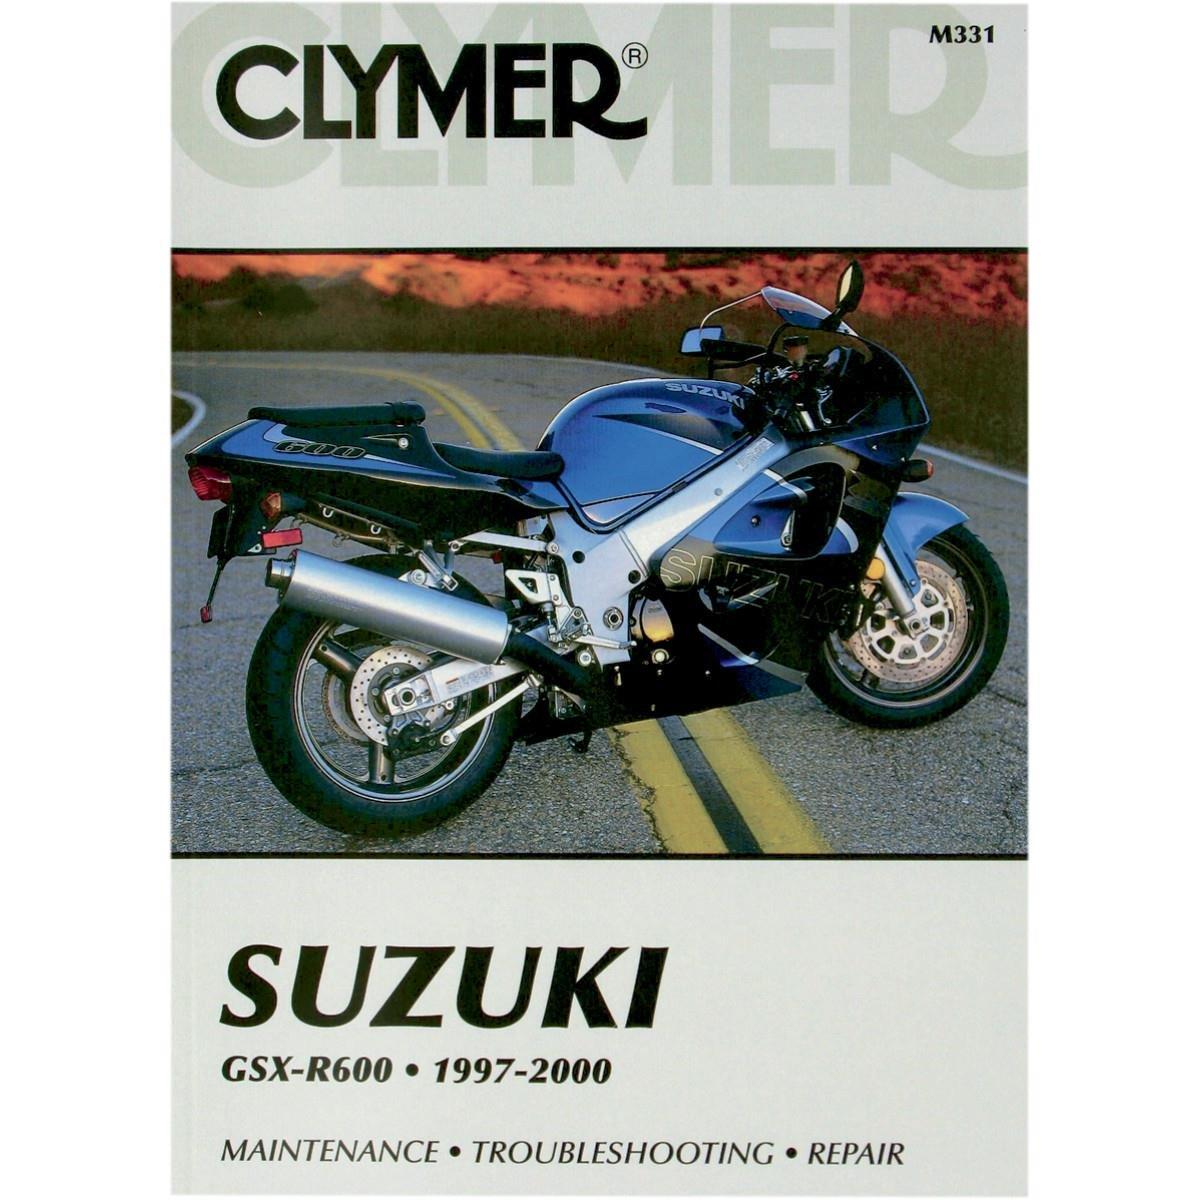 Amazon.com: Clymer Repair Manual for Suzuki GSX-R600 GSXR-600 97-00:  Automotive